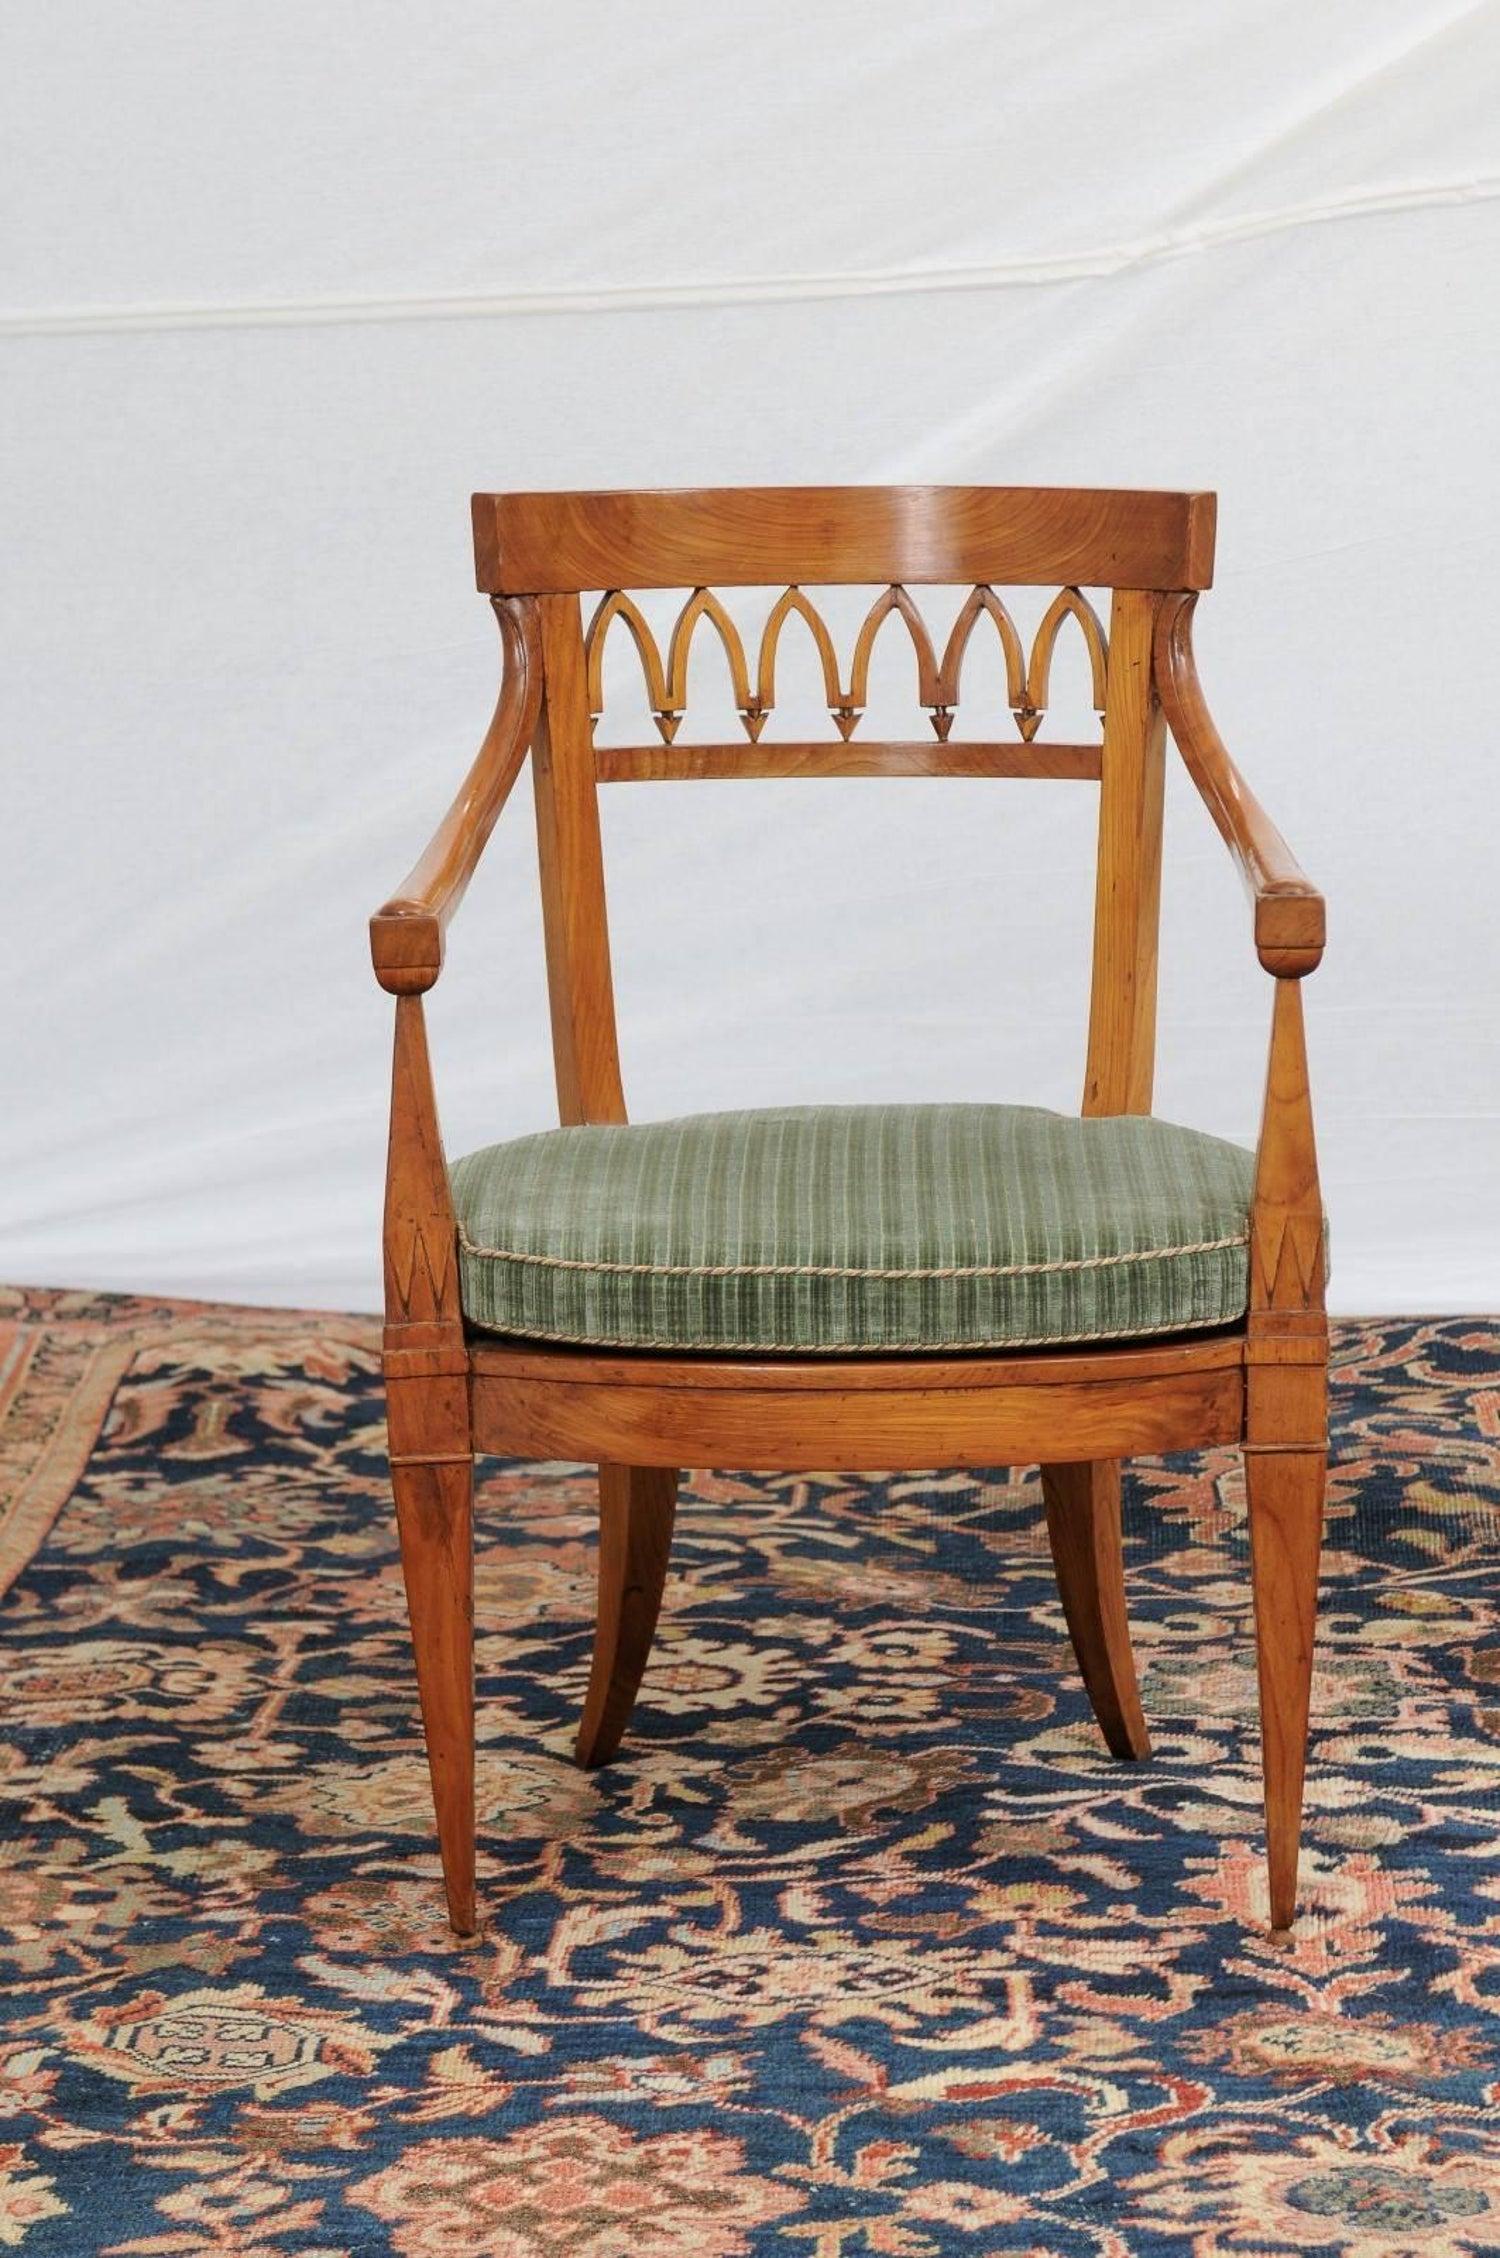 Abp 656 pair of austrian biedermeier 1840s, armchairs with pierced backs and cane  seats